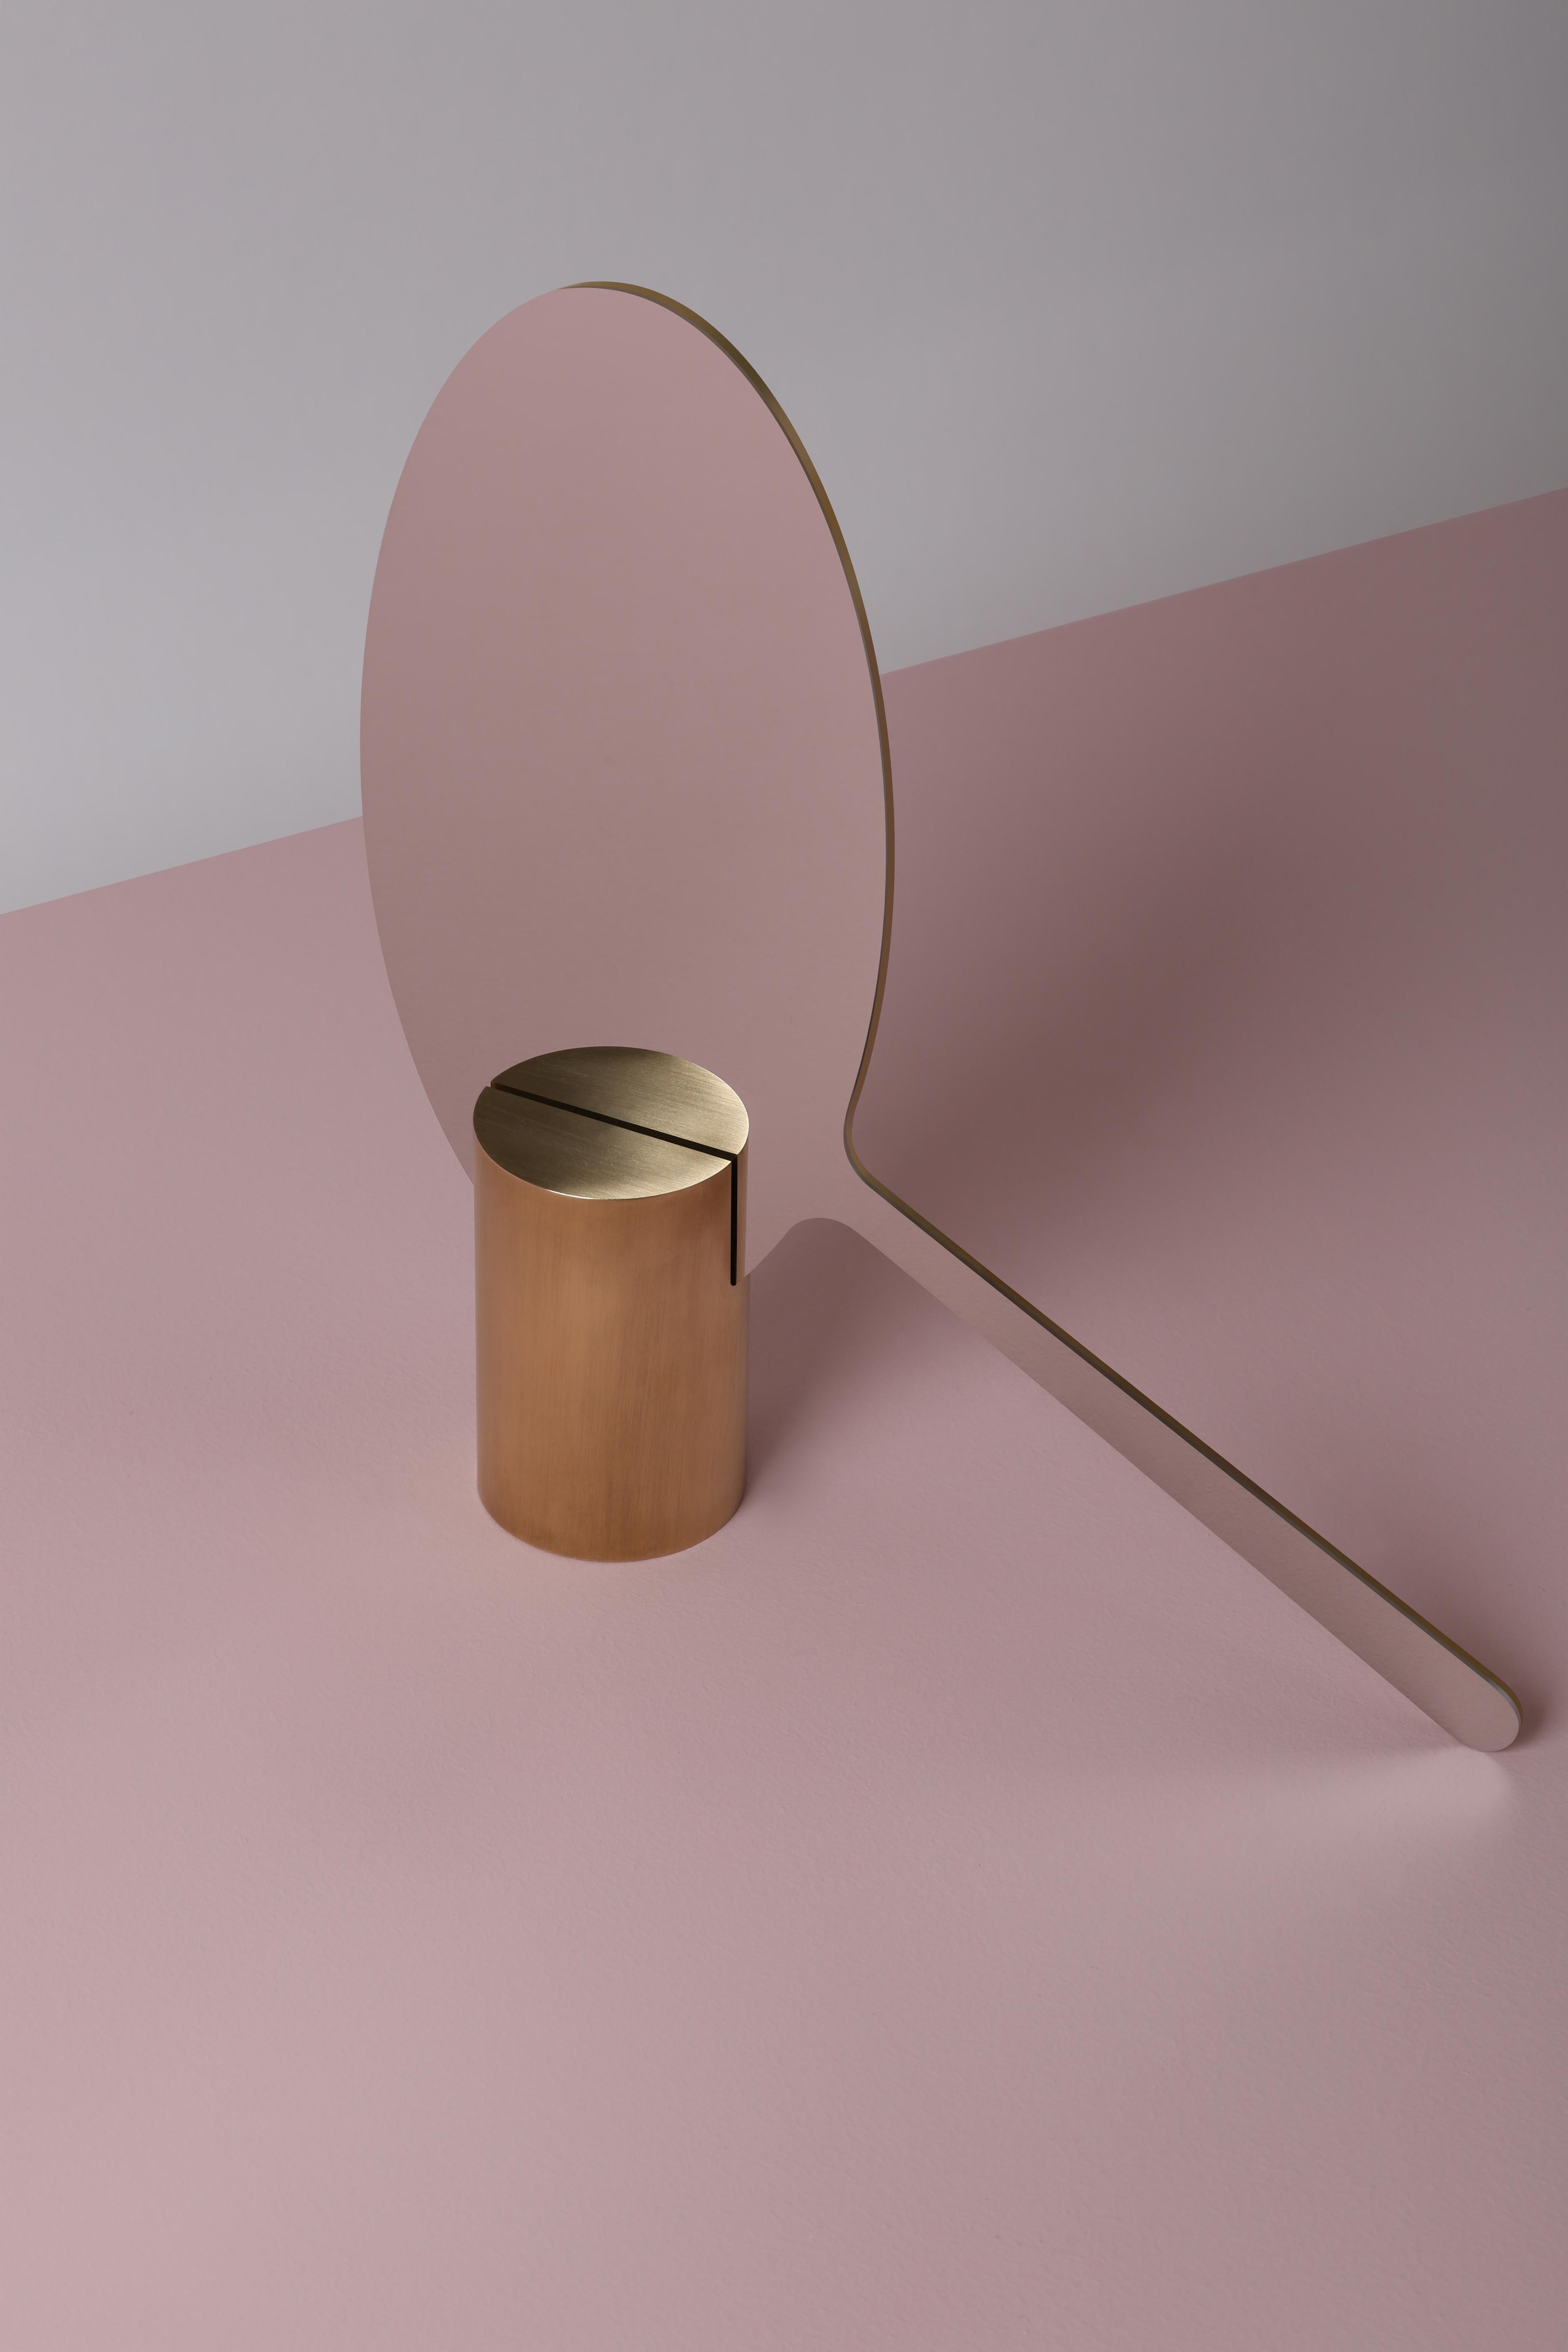 Ashkal-Miroirs-Richard-Yasmine-Design-Savannah-Bay-Gallery